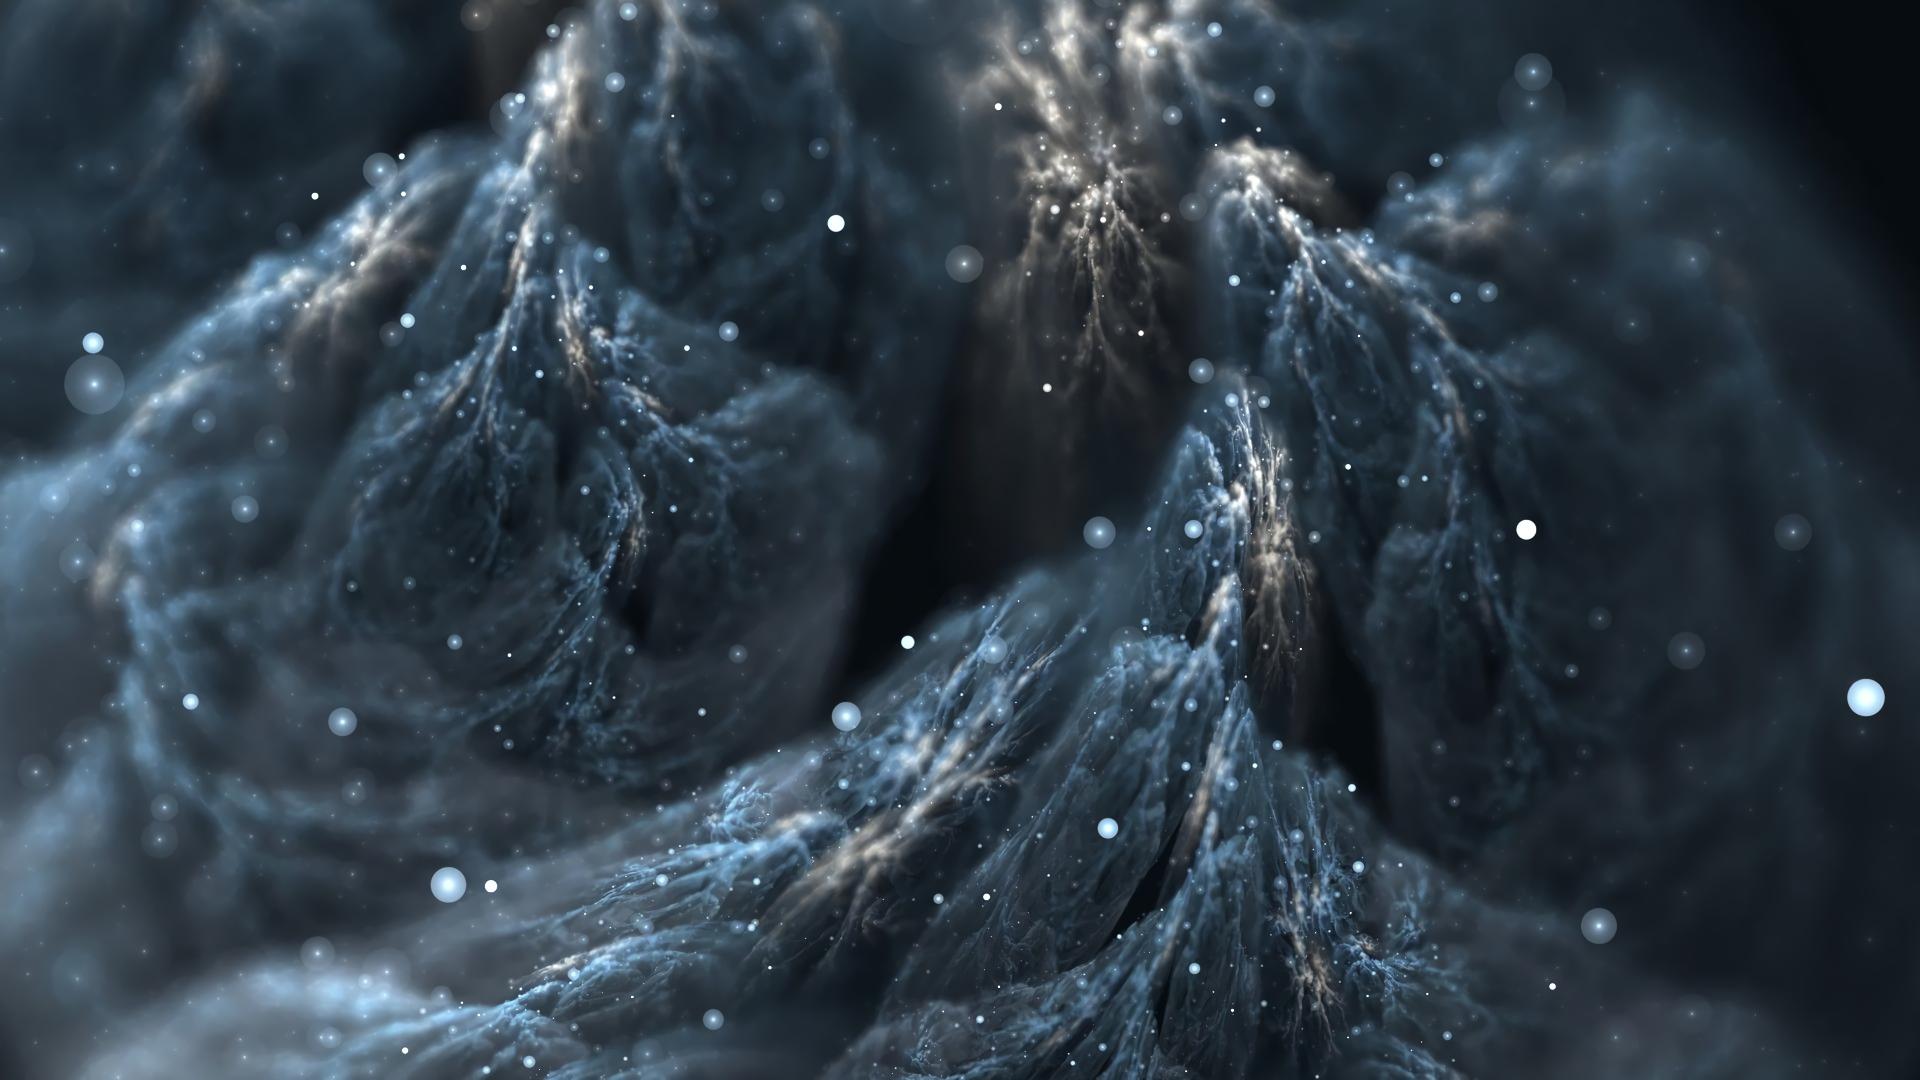 Crystal Wallpaper For Walls: Sparkling Crystal Close-up HD Wallpaper